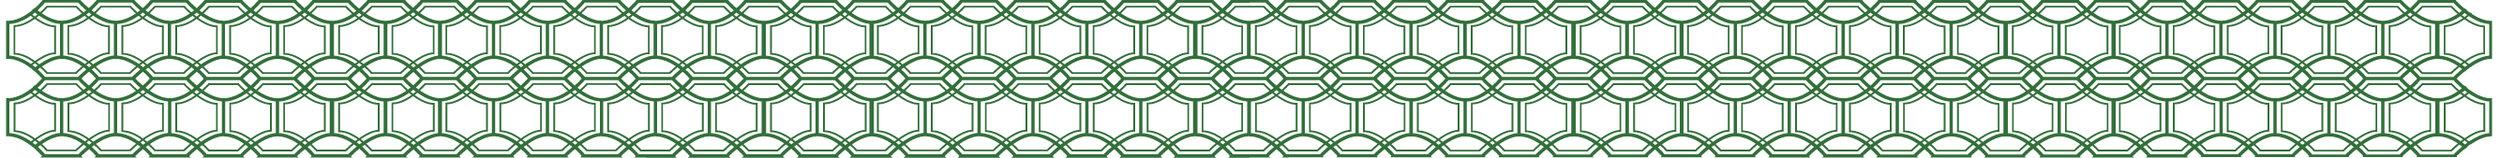 Pattern-Banner-skinny-01.jpg